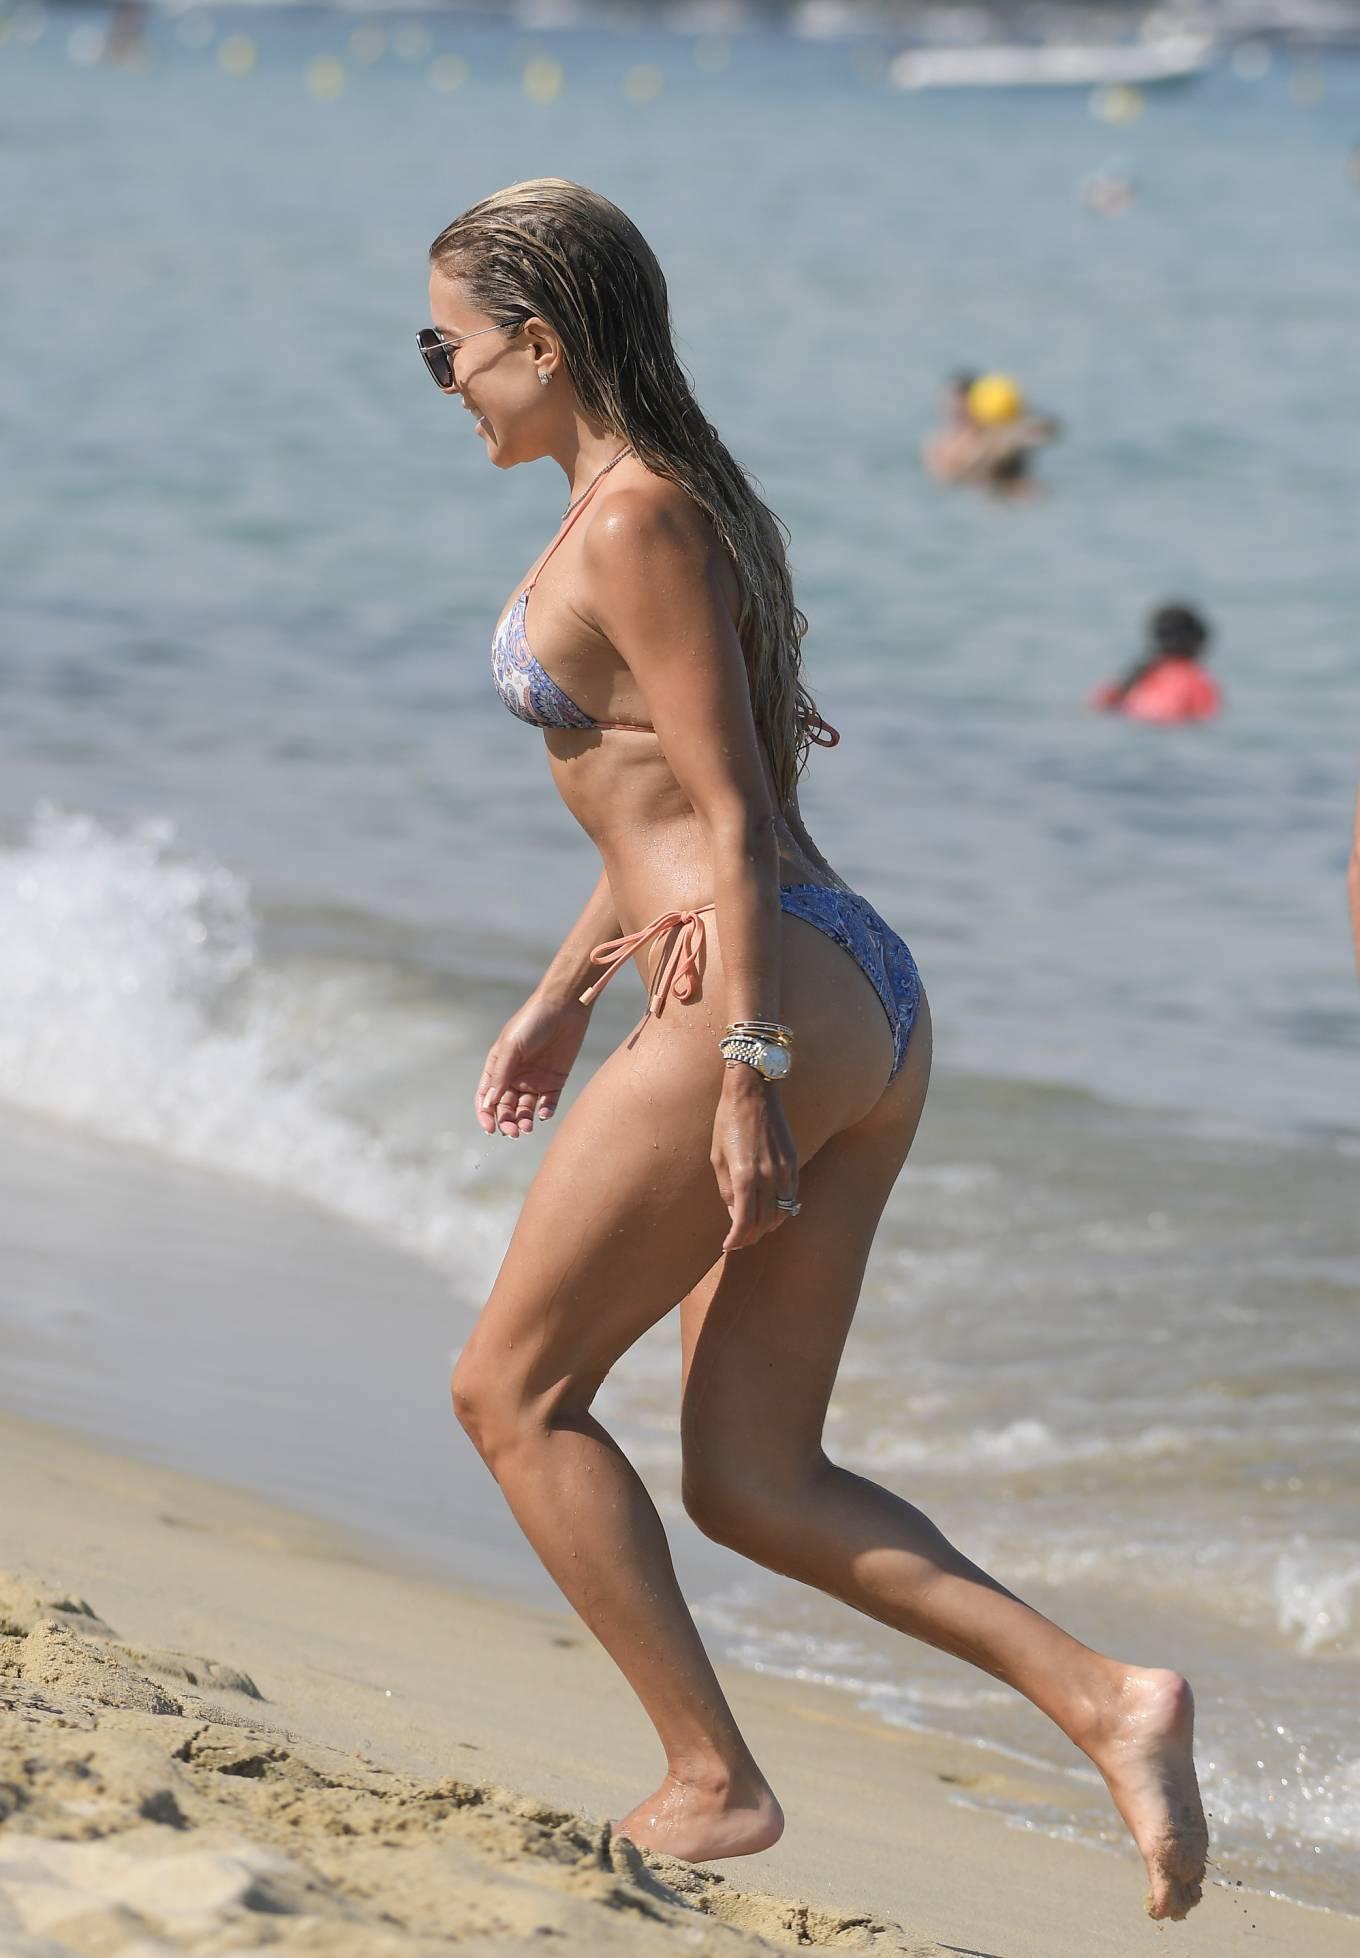 Sylvie Meis 2021 : Sylvie Meis – In a bikini with her husband Niclas Castello on the beach La Réserve in Ramatuelle-27